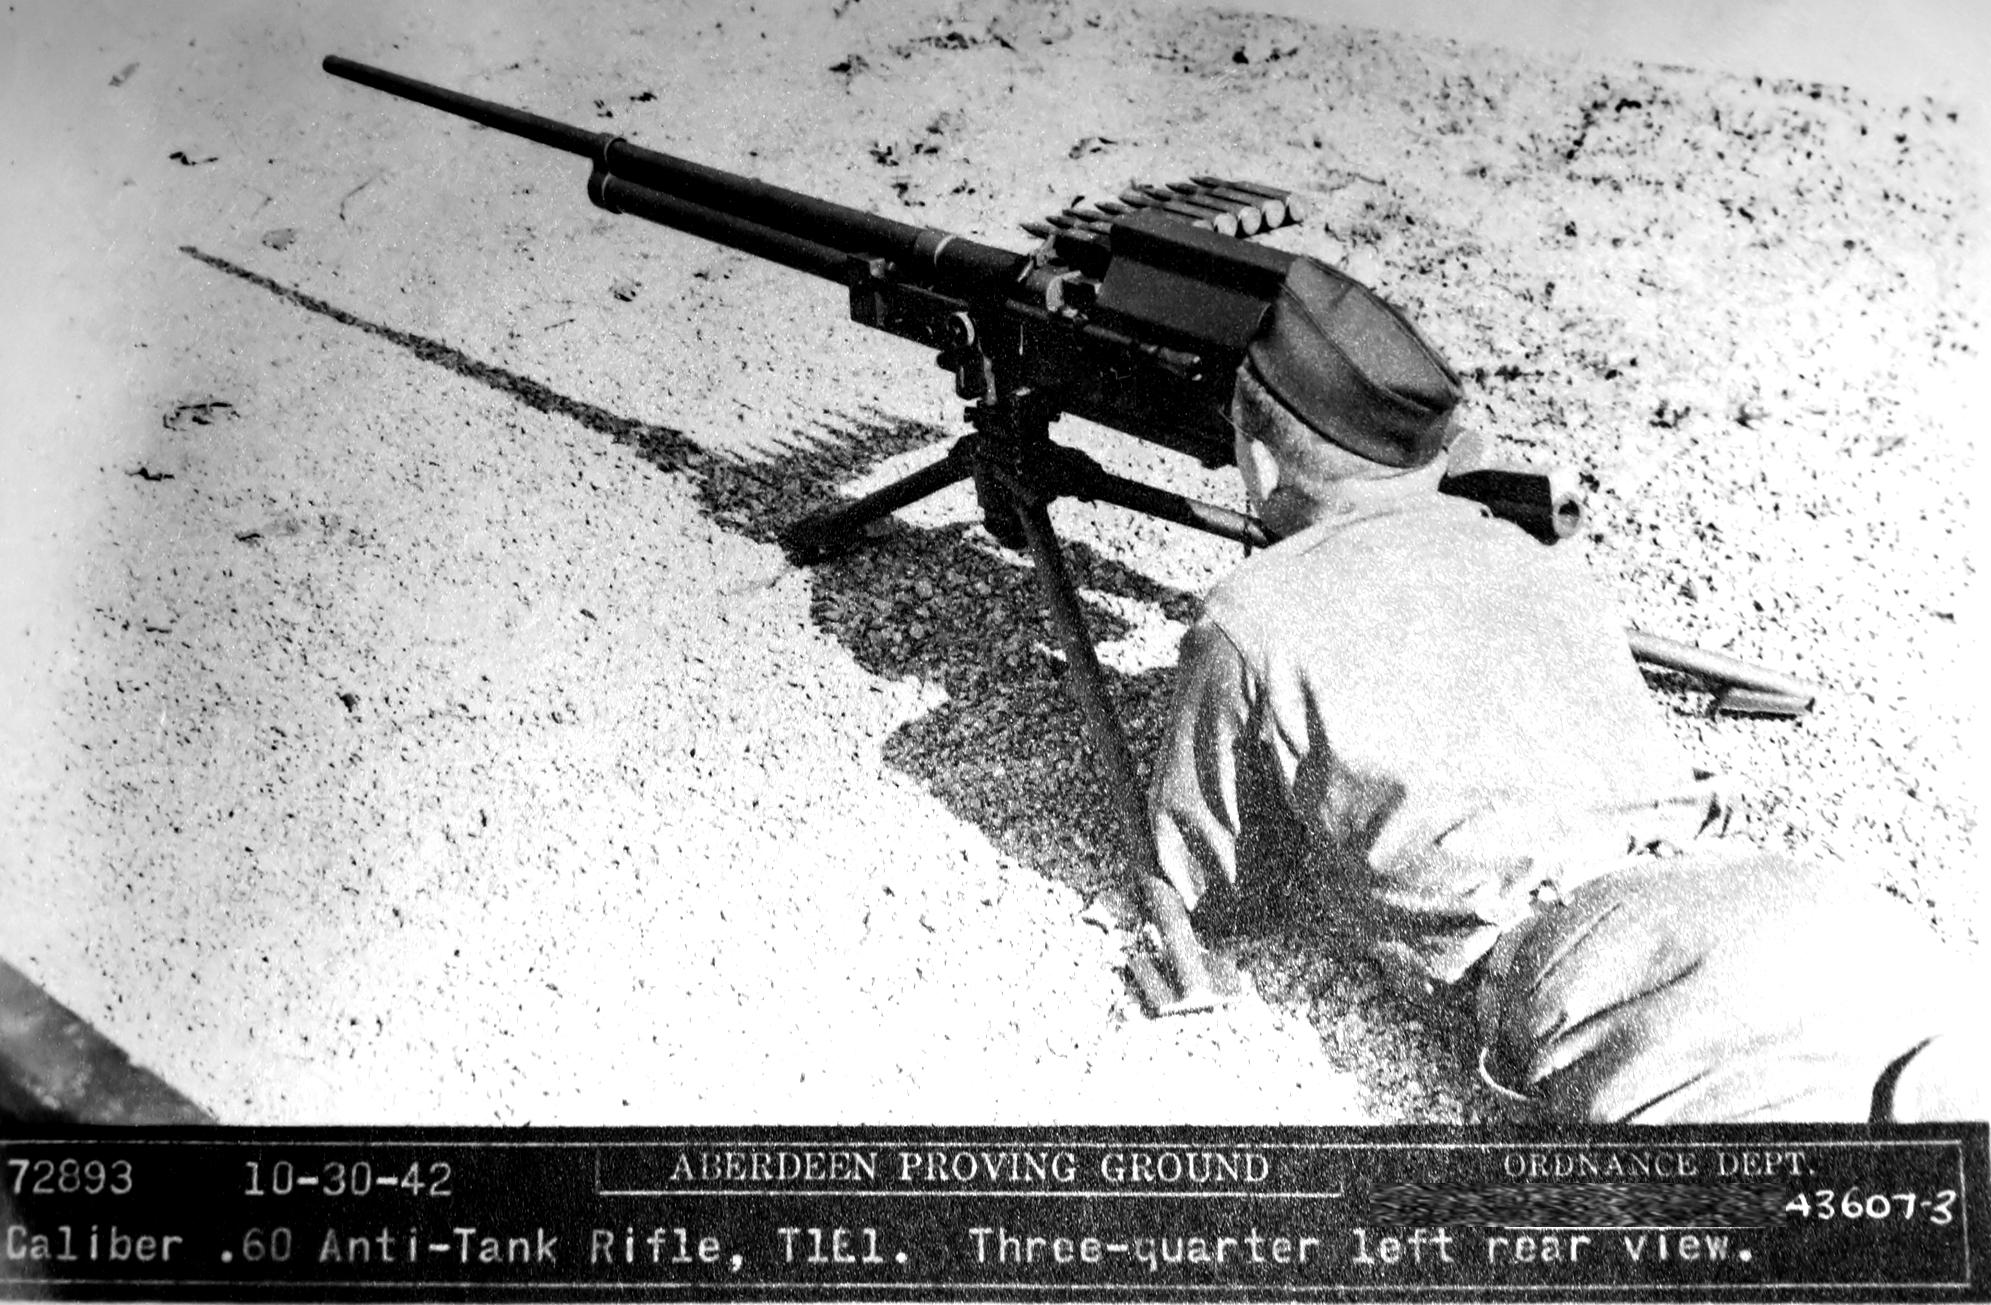 T1/T1E1 アメリカ製.60口径対戦車ライフル | TeamBtrb